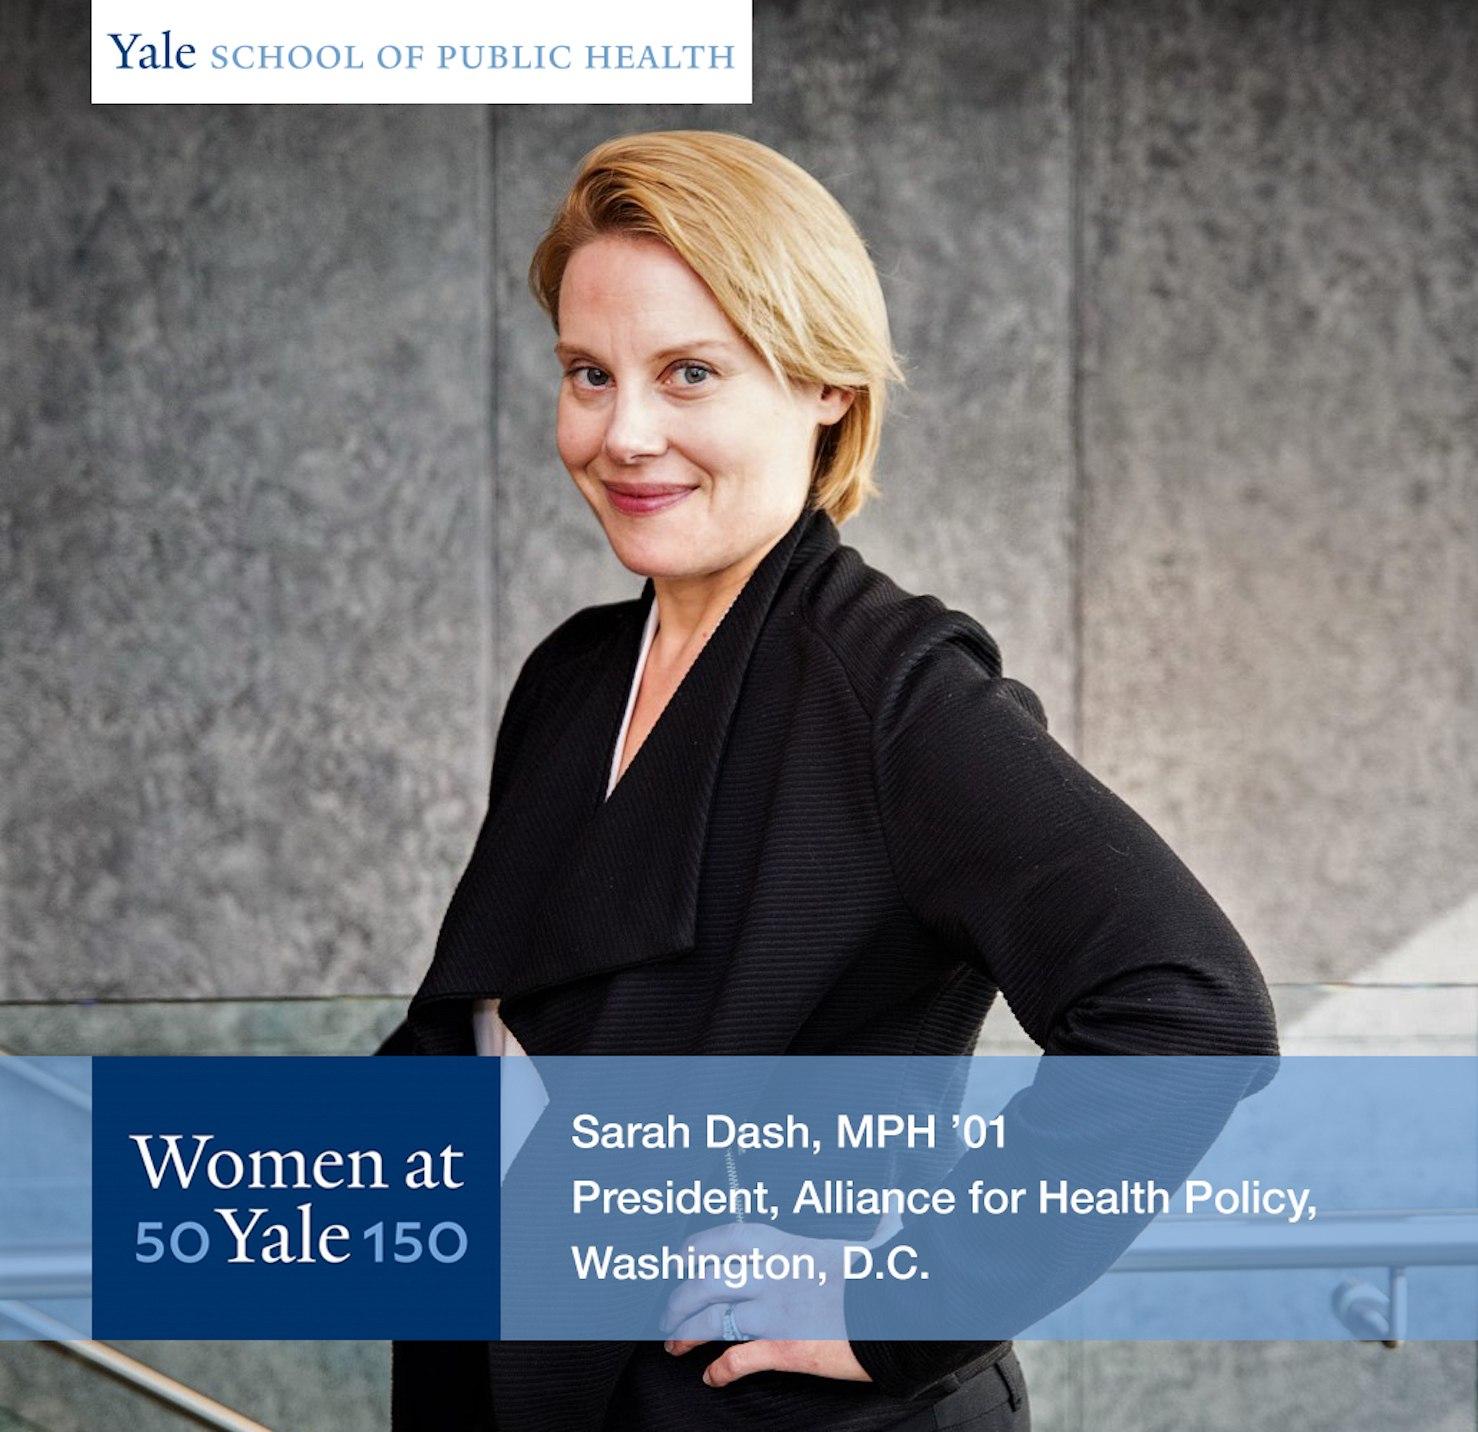 Sarah Dash, MPH '01